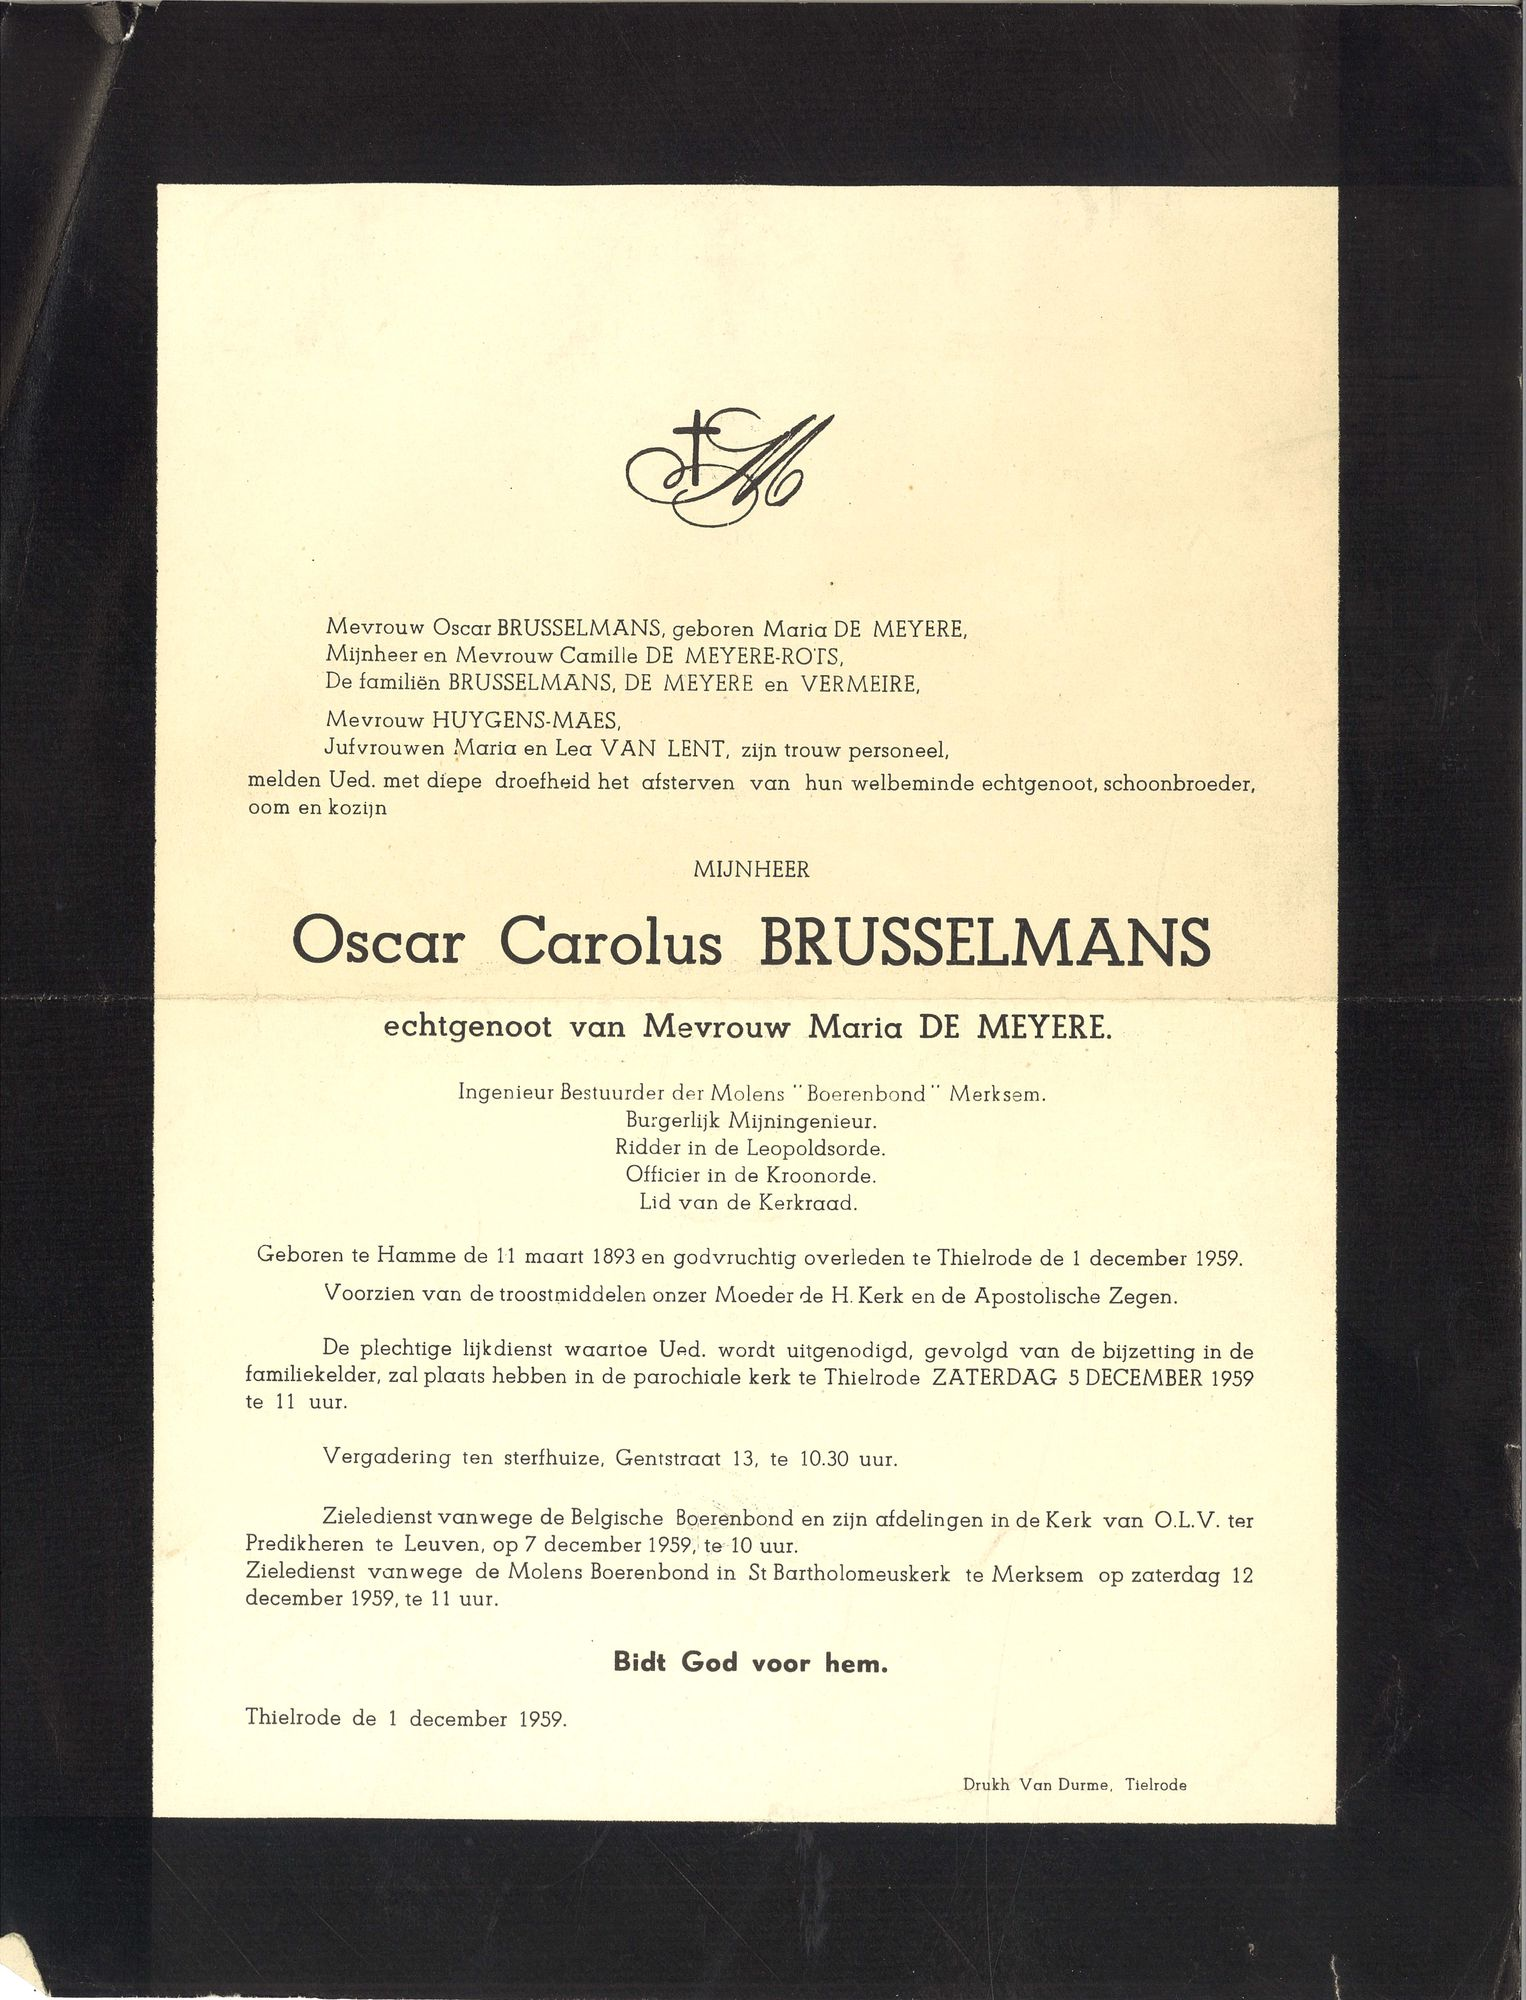 Oscar Carolus Brusselmans